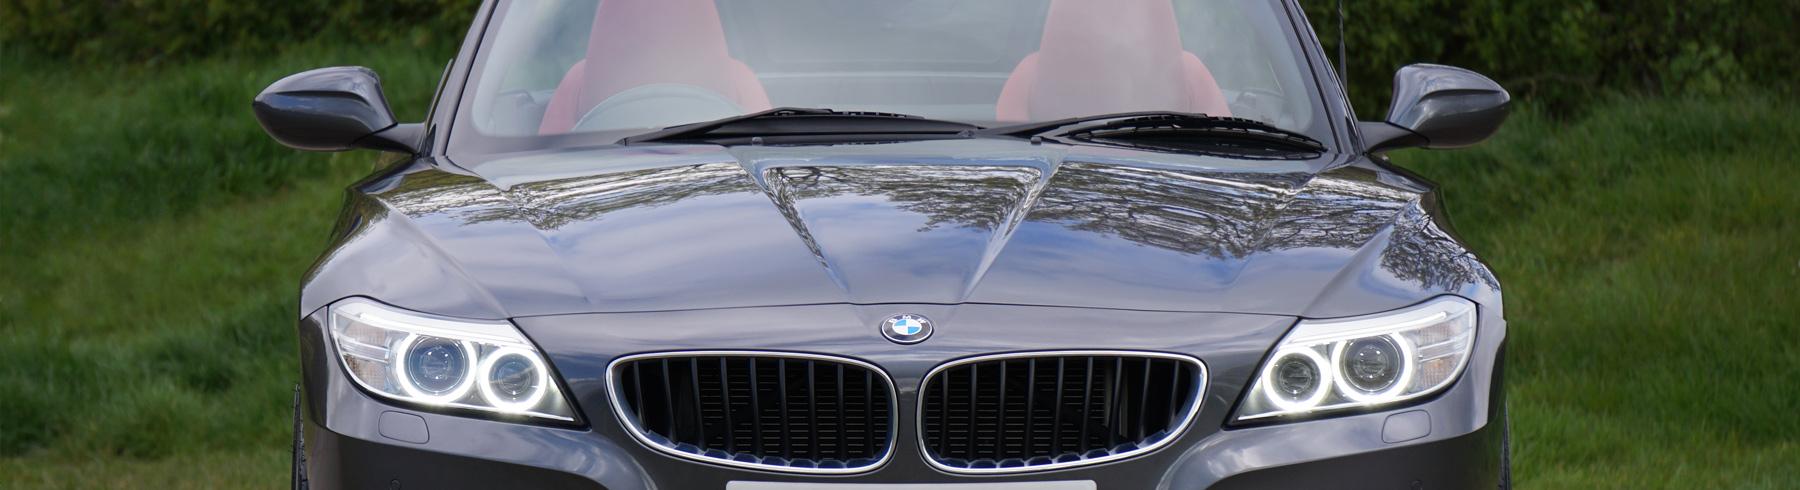 Auto Serve Vehicle Solutions